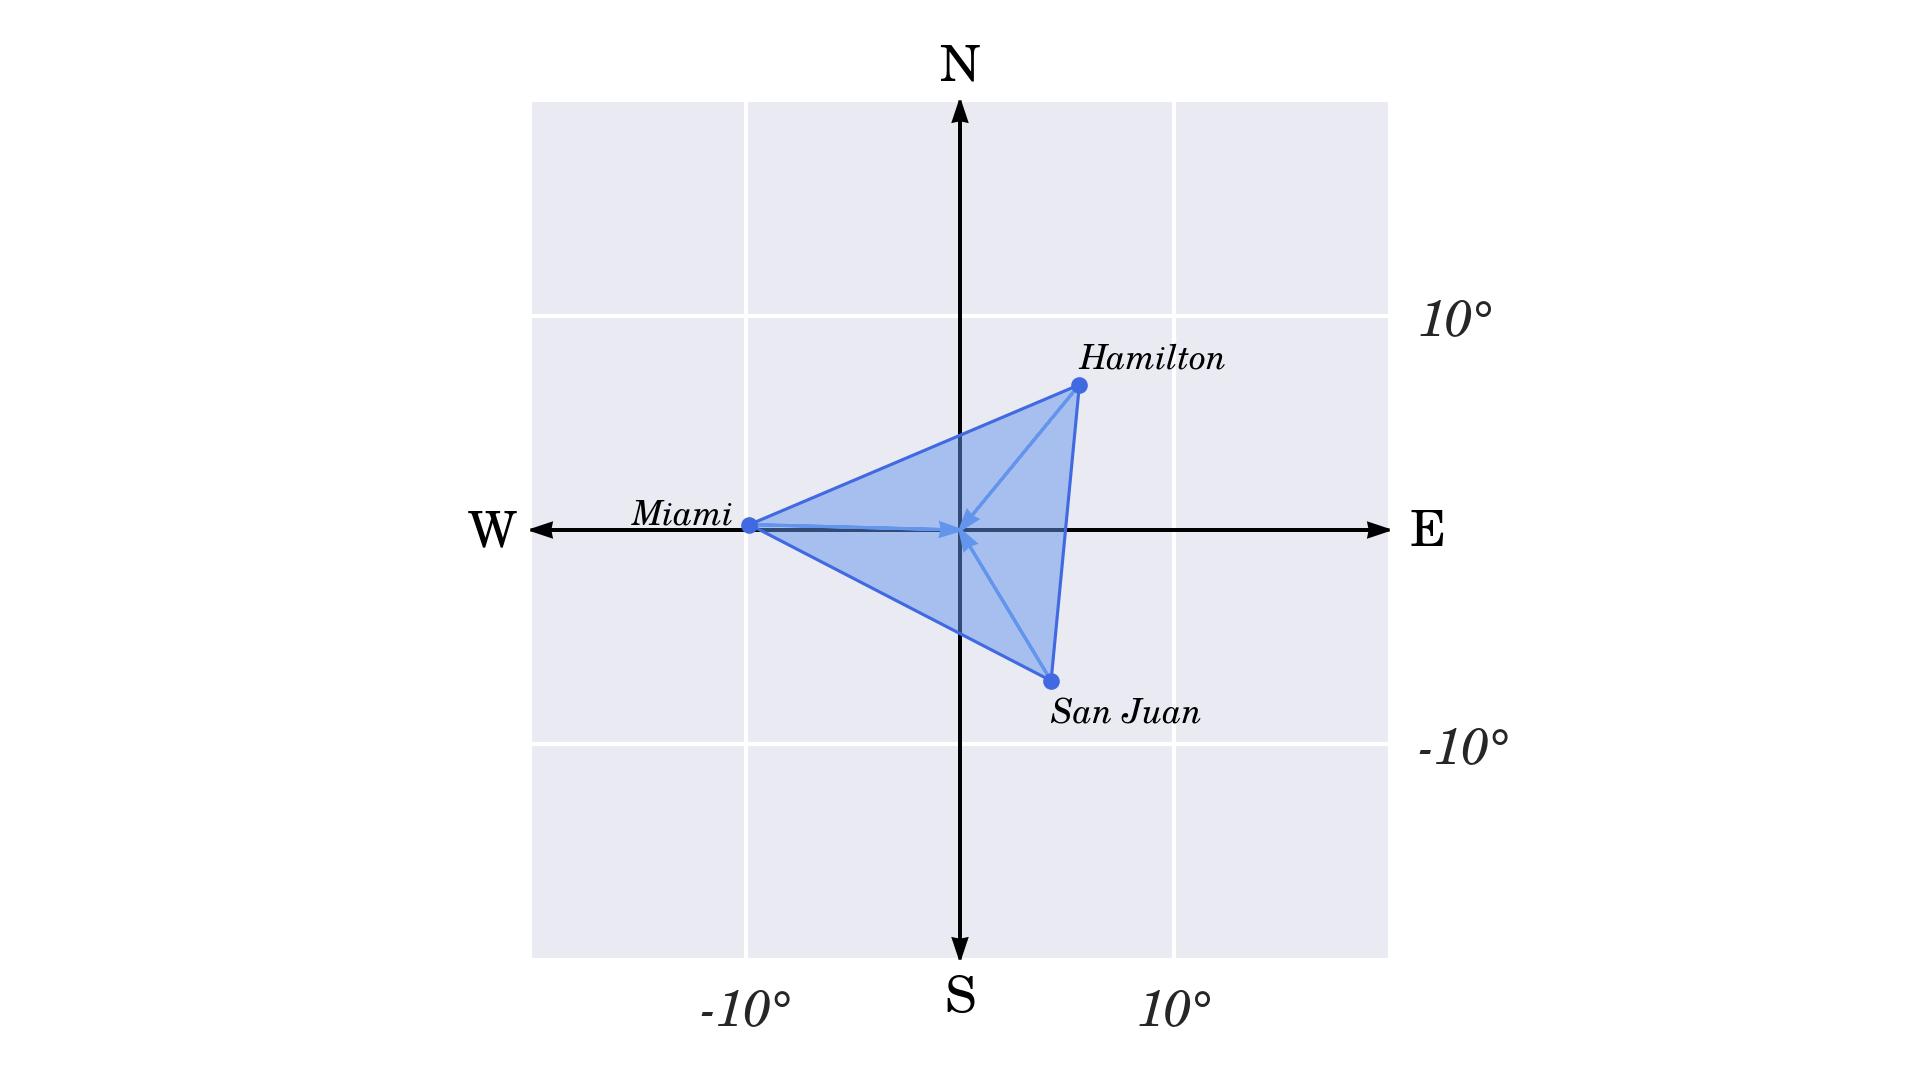 Translation of the Bermuda Triangle